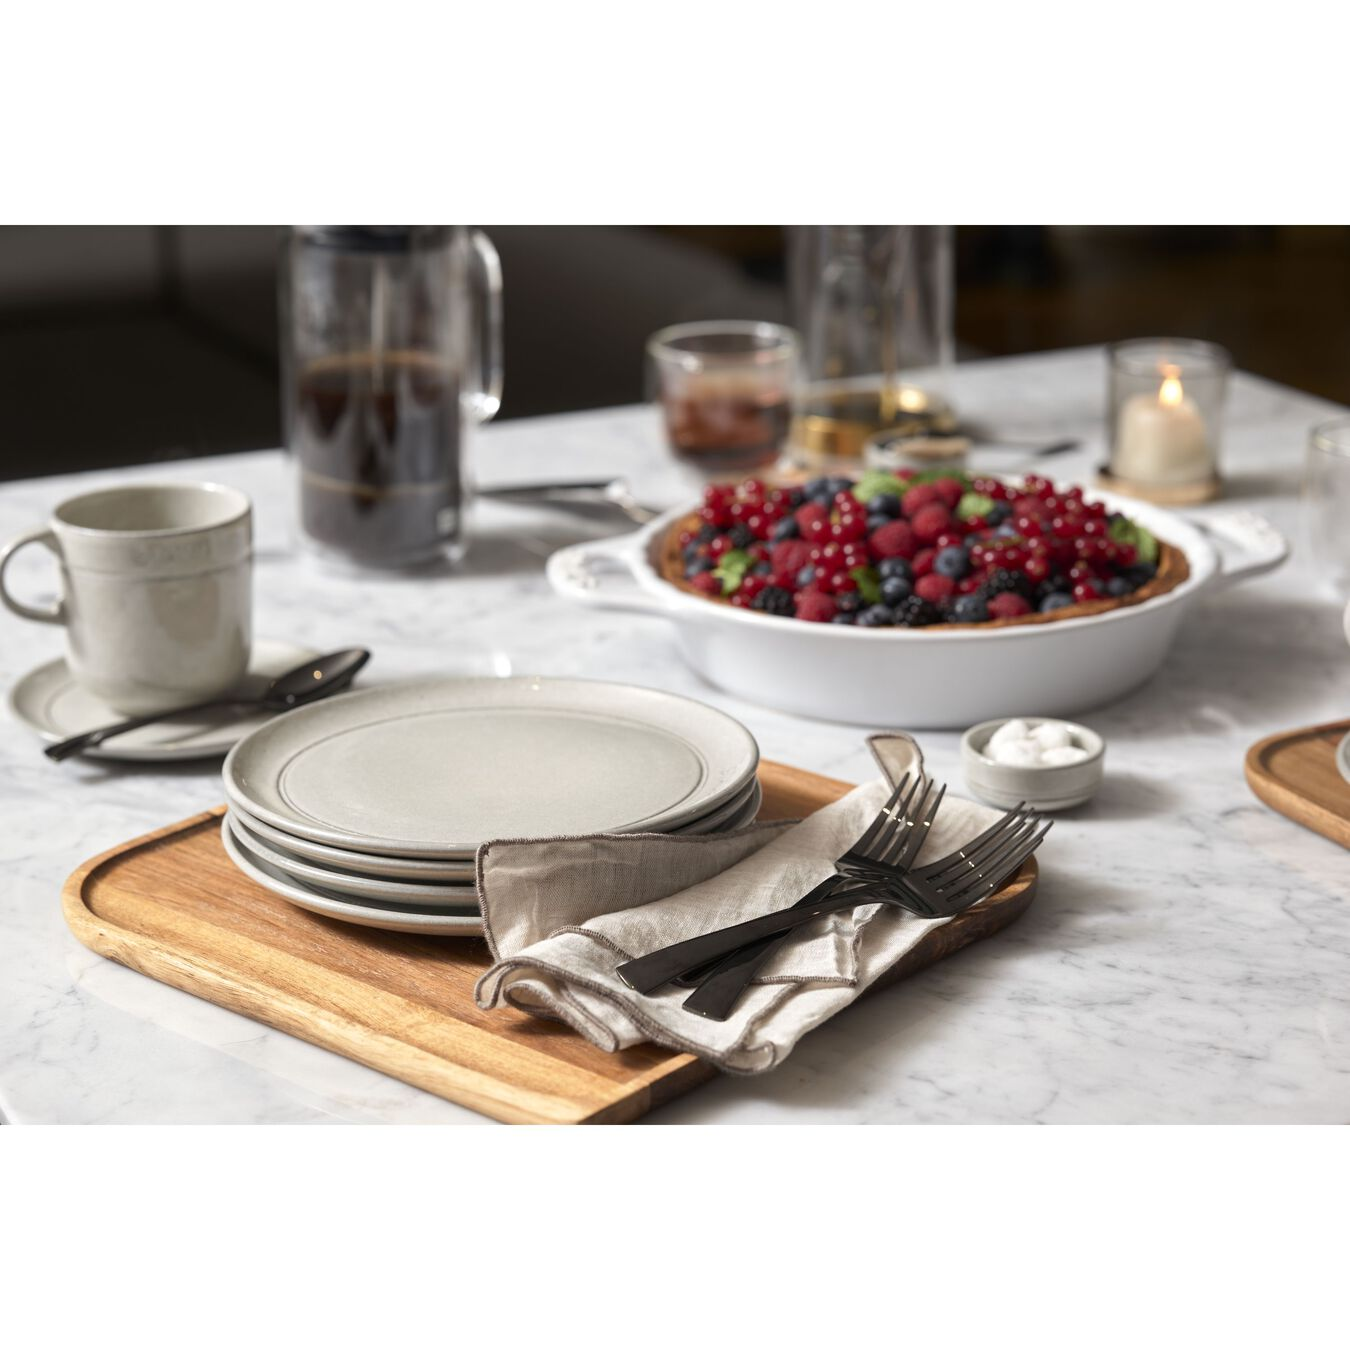 20 cm Ceramic round Assiette flat, White Truffle,,large 4